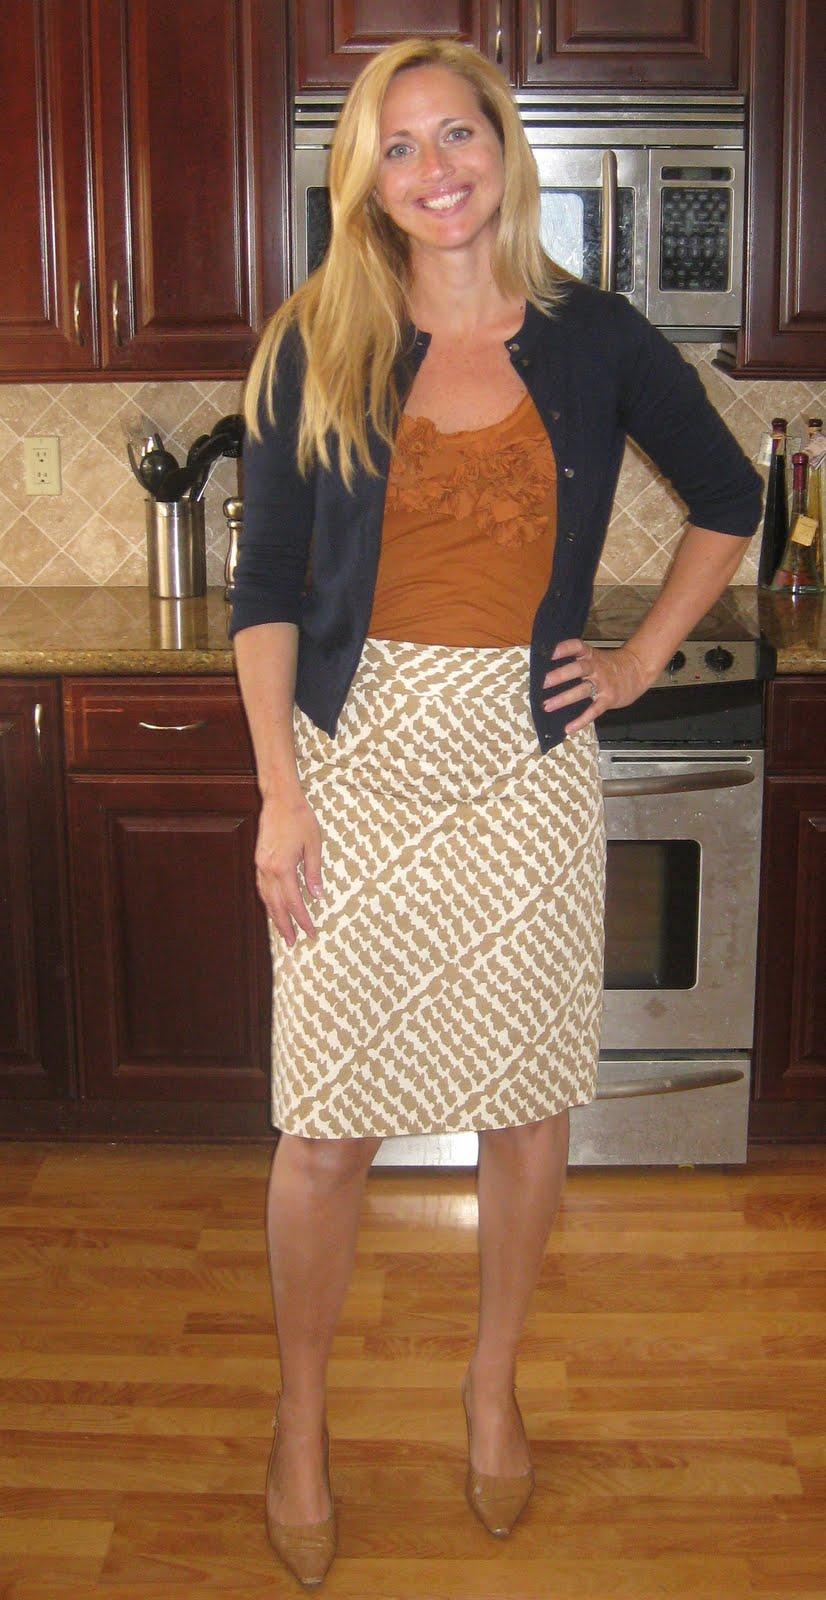 Uncategorized Modestly Styled modestly styled me august 2010